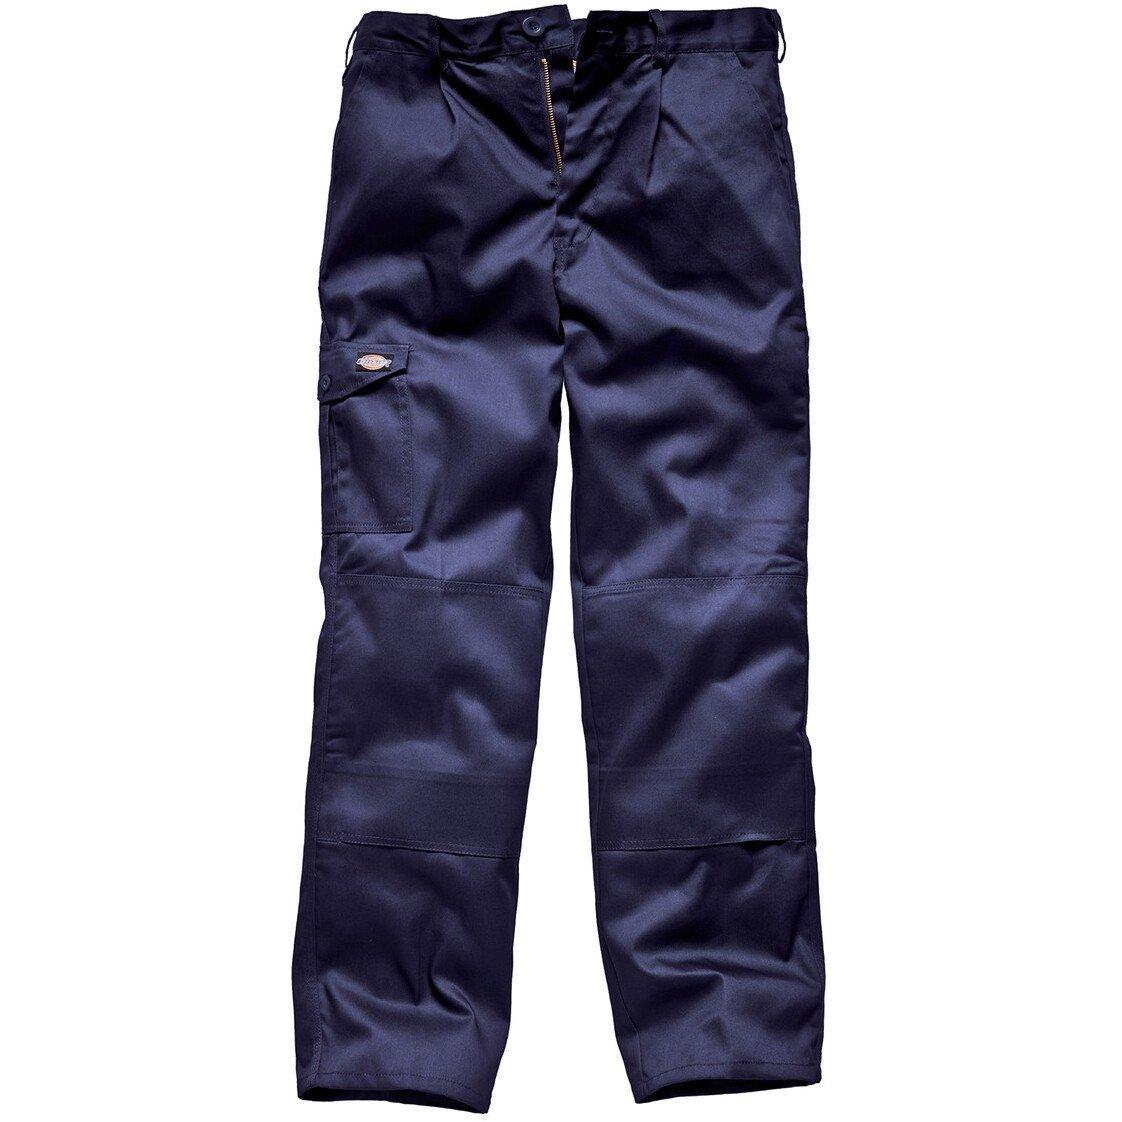 "Dickies WD884 Redhawk Super Work Trousers - Navy Blue - WAIST 48"" Regular Leg"